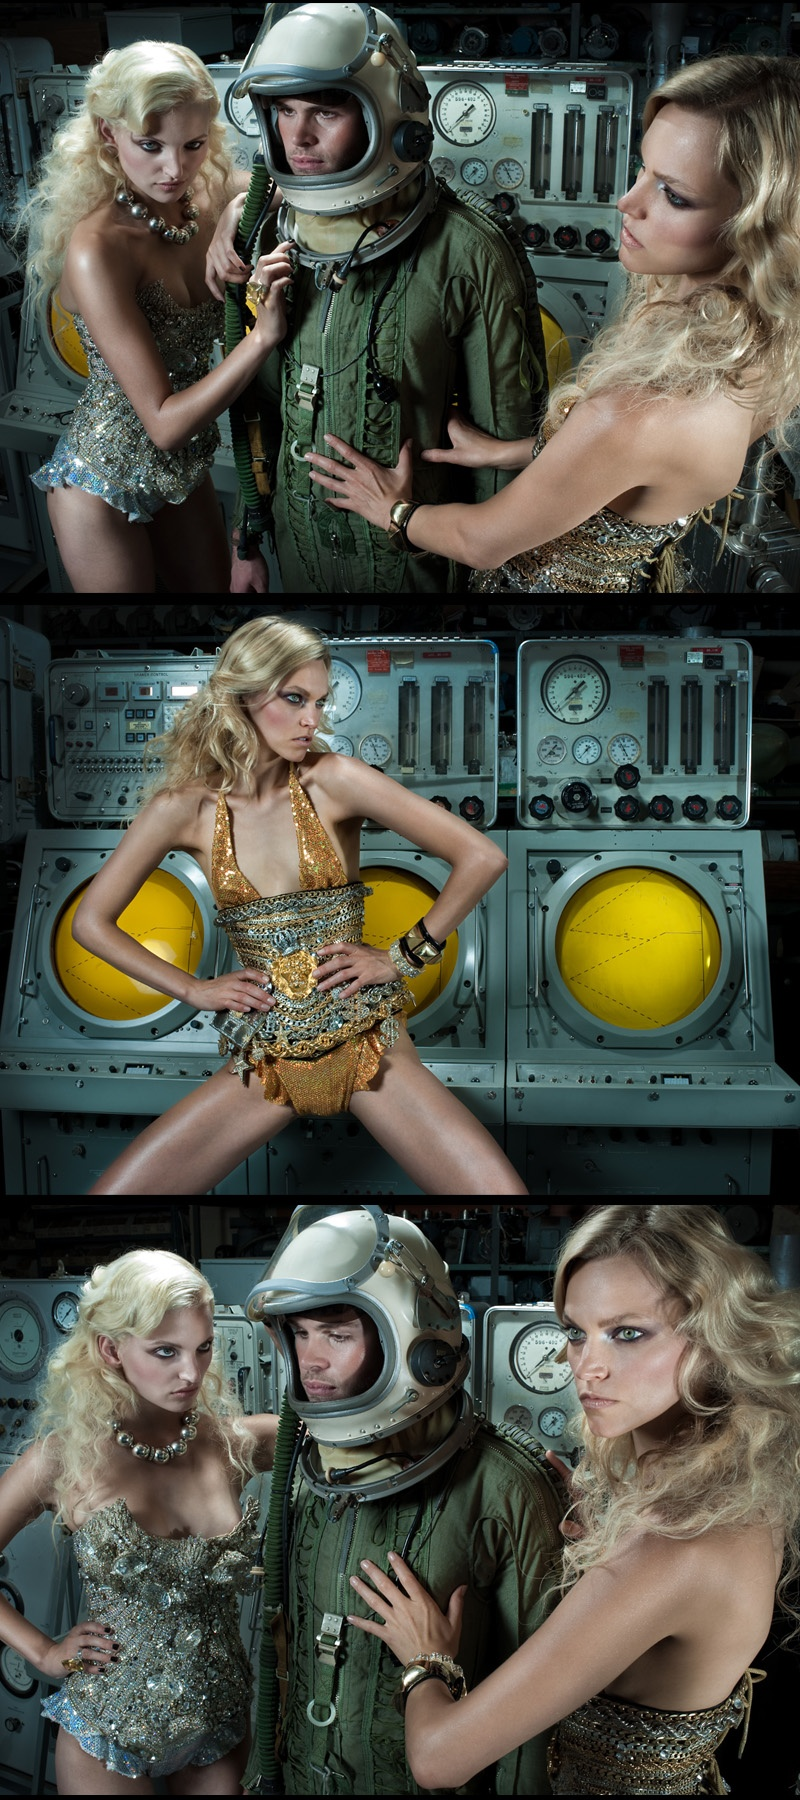 Studio Apr 12, 2010 fotoigaist Rocketman, Stylist: Lindsay Albanese, Models: LA models